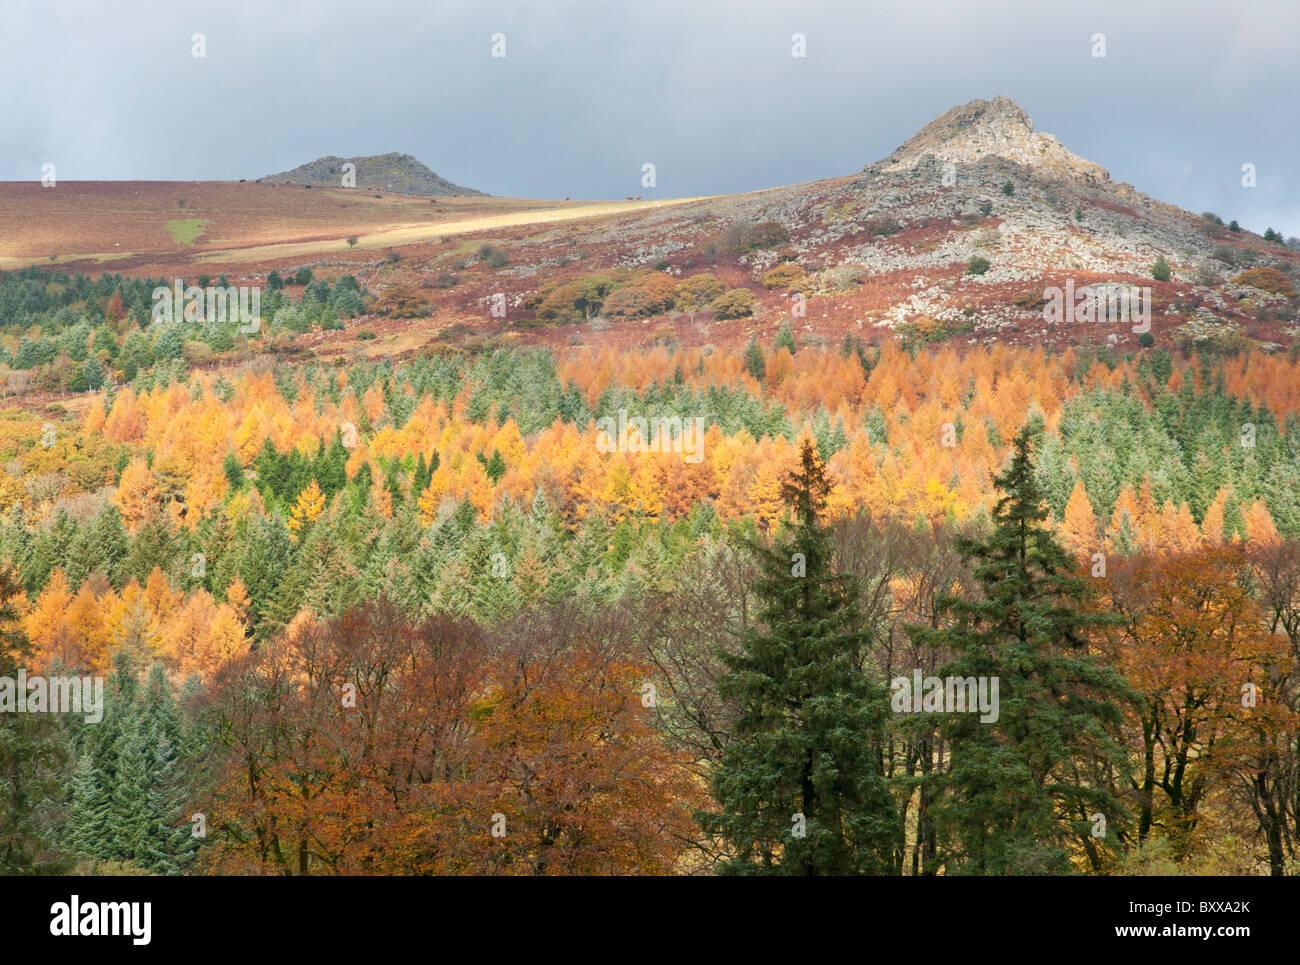 Layers of coniferous woodland in autumn colouring below tors on Dartmoor, Devon UK - Stock Image